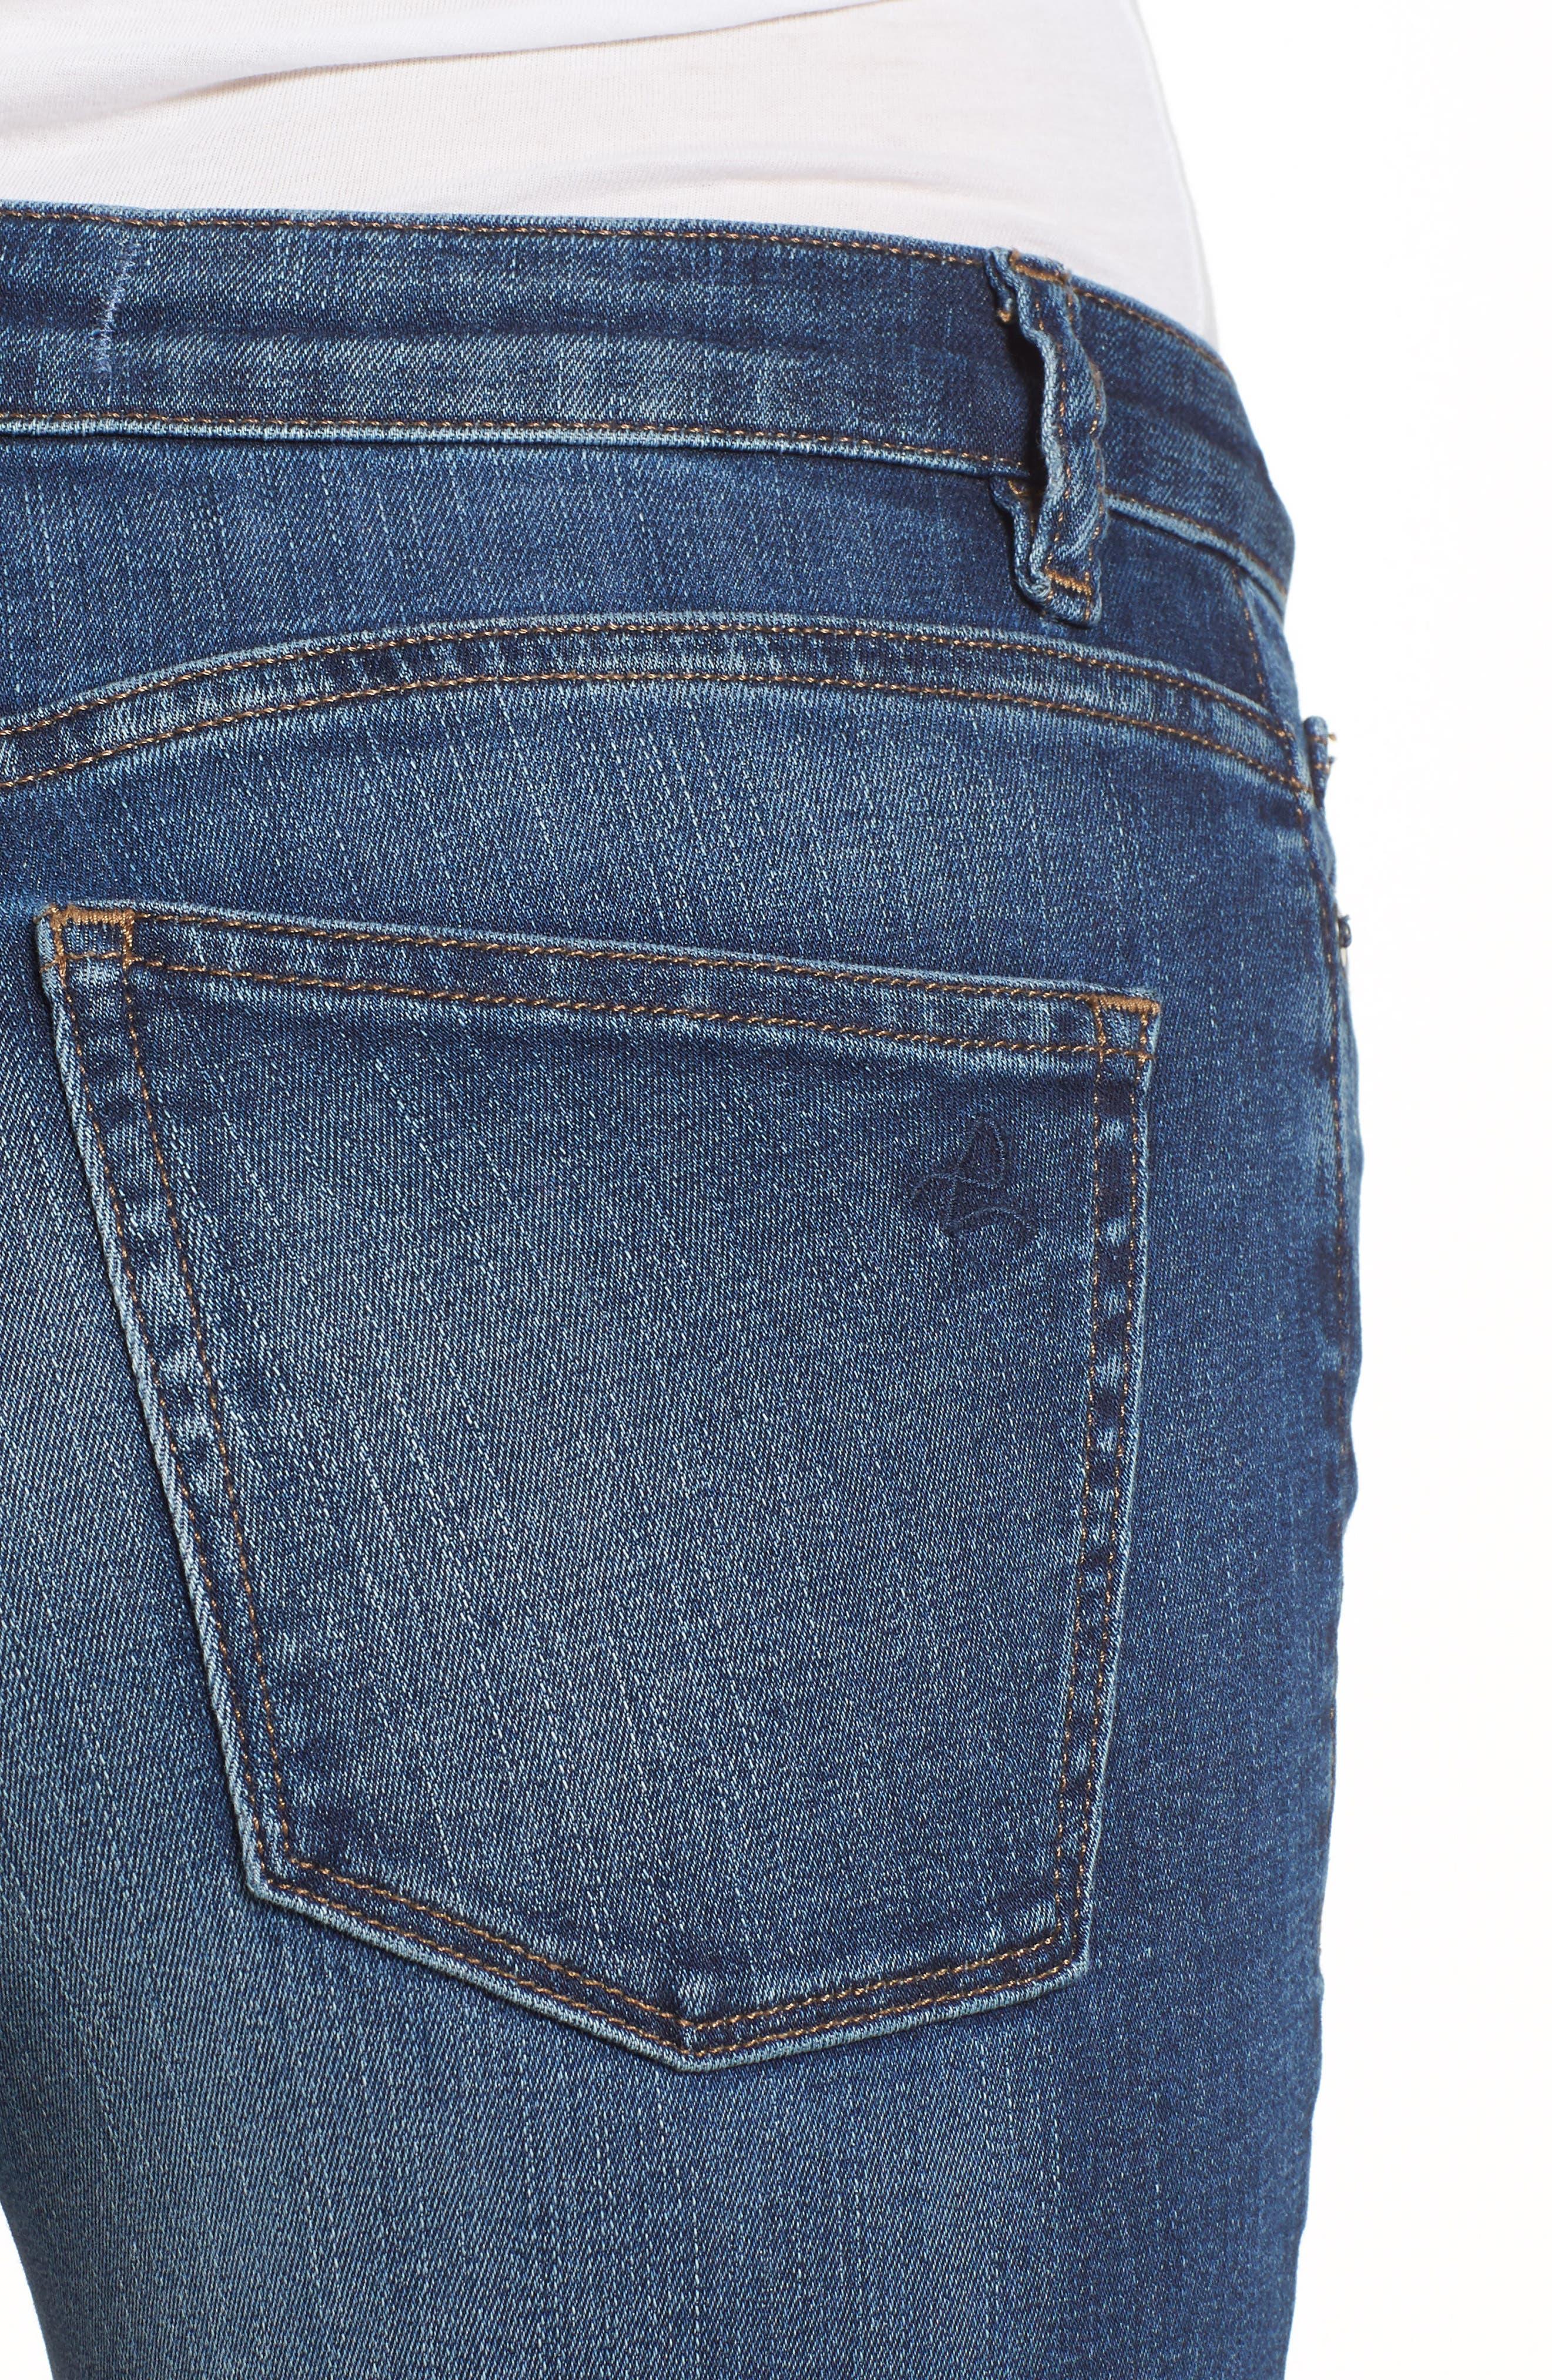 Chrissy Trimtone High Waist Skinny Jeans,                             Alternate thumbnail 4, color,                             Bal Harbour